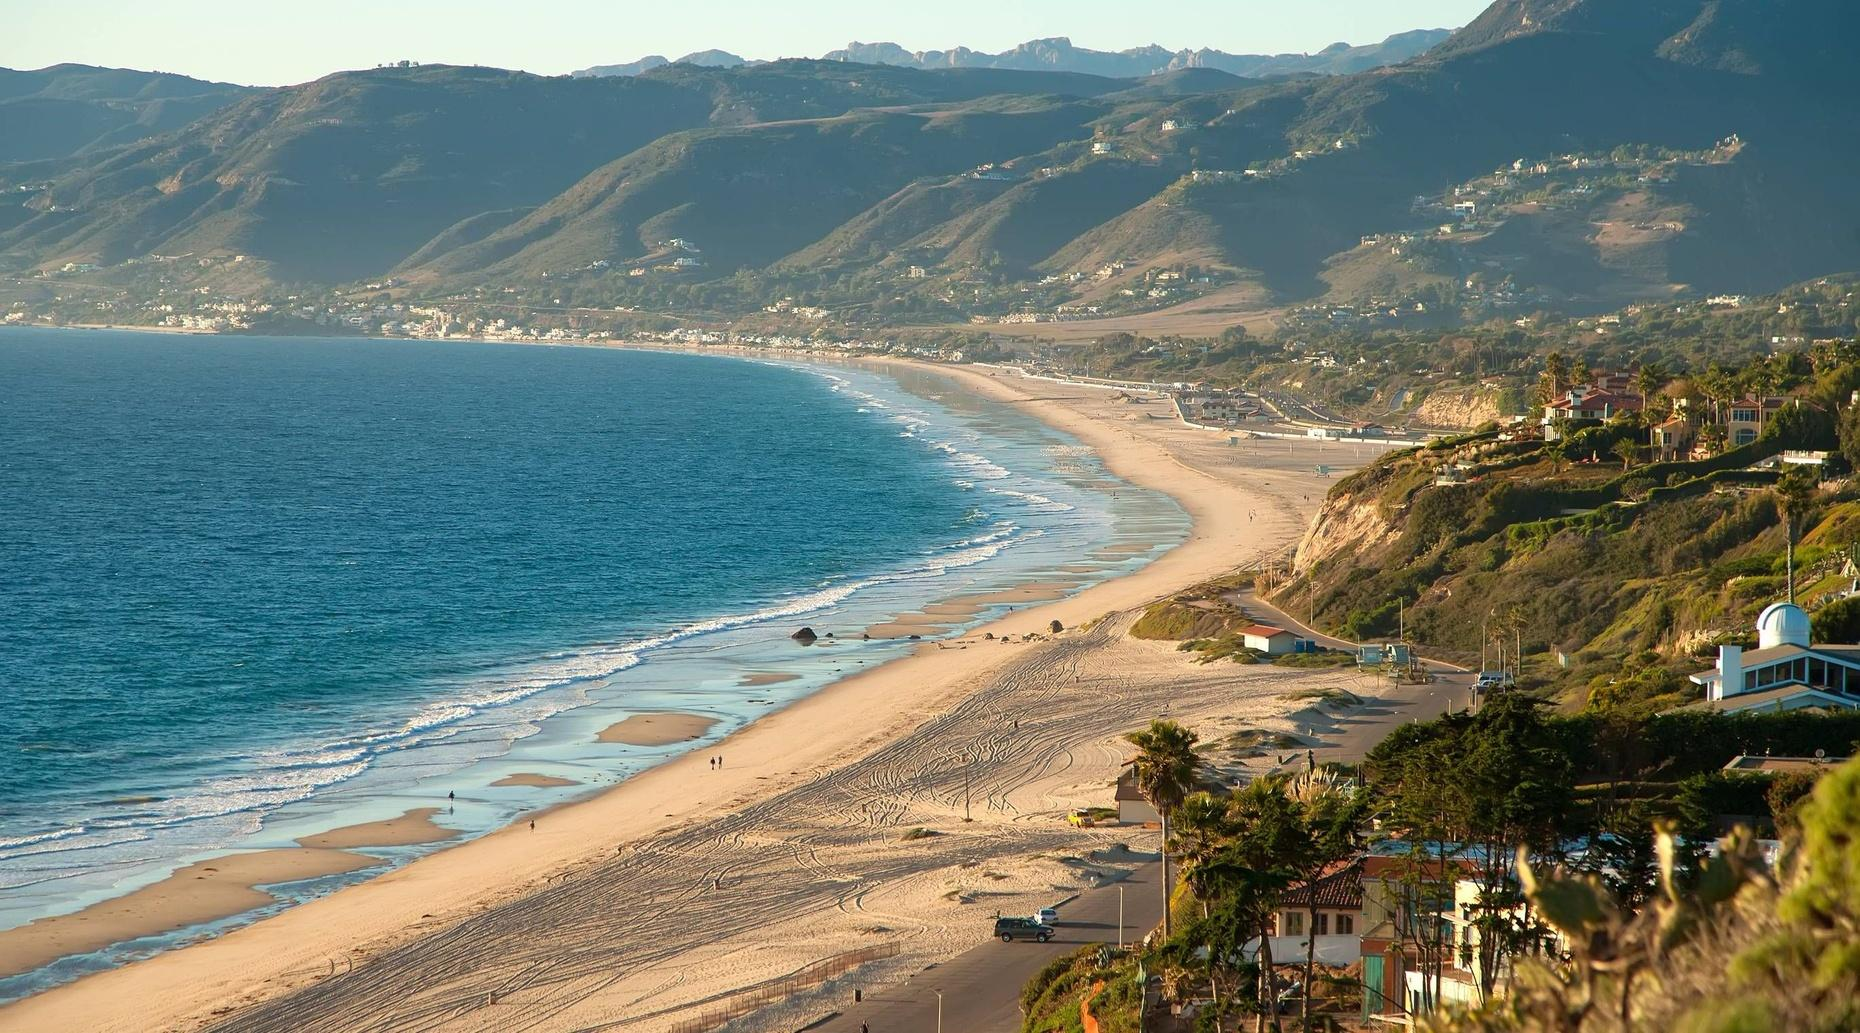 Private Los Angeles City & Beach Tour